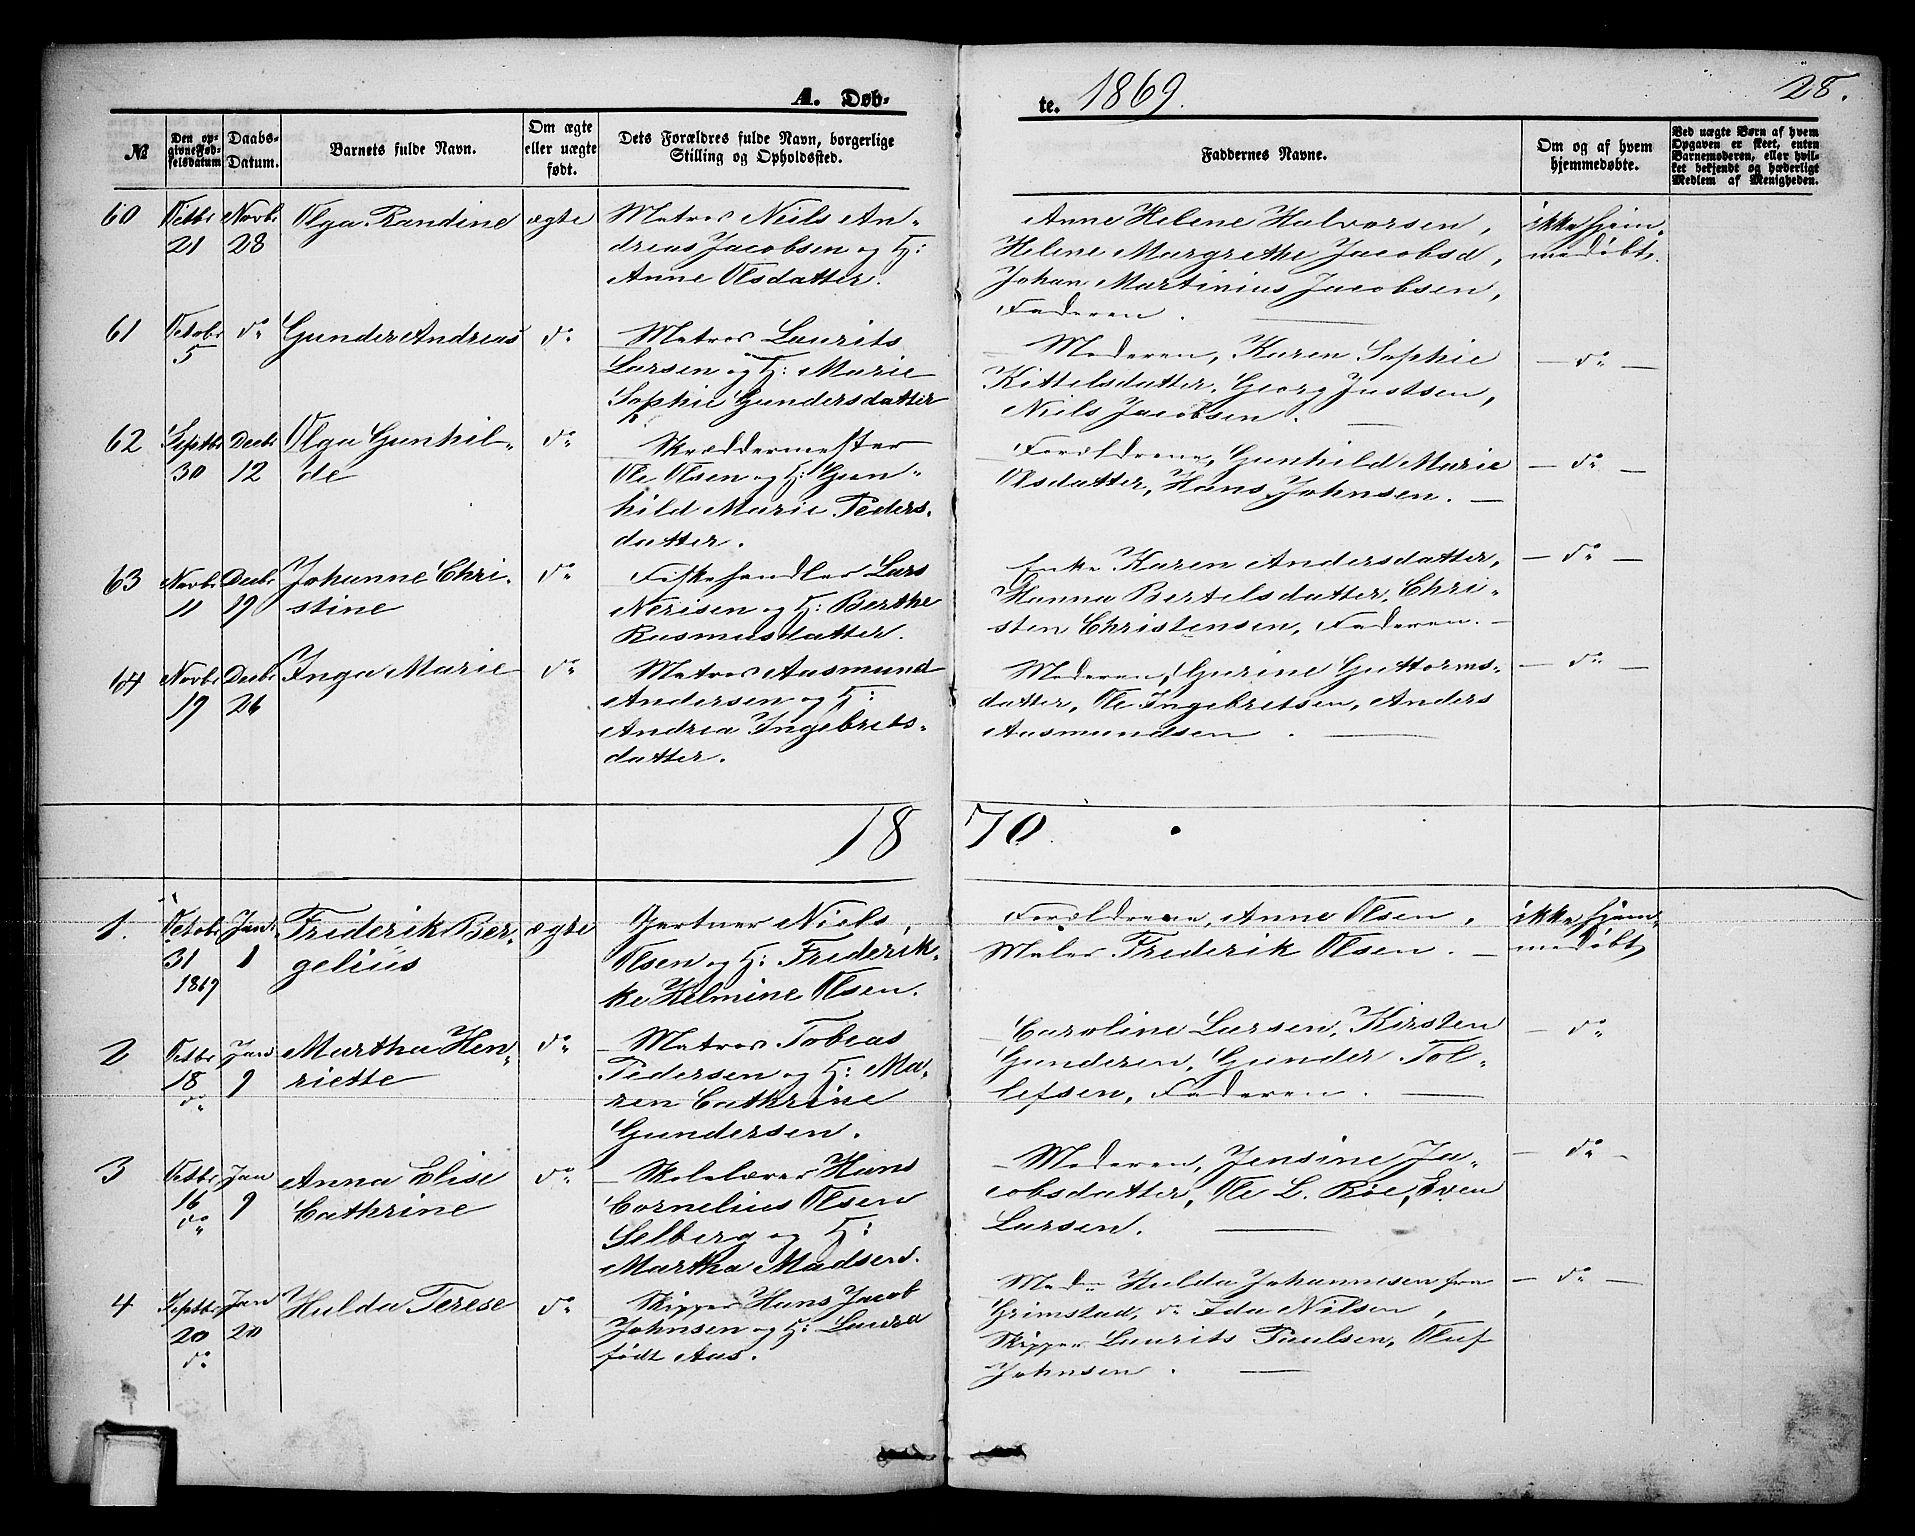 SAKO, Brevik kirkebøker, G/Ga/L0003: Klokkerbok nr. 3, 1866-1881, s. 28